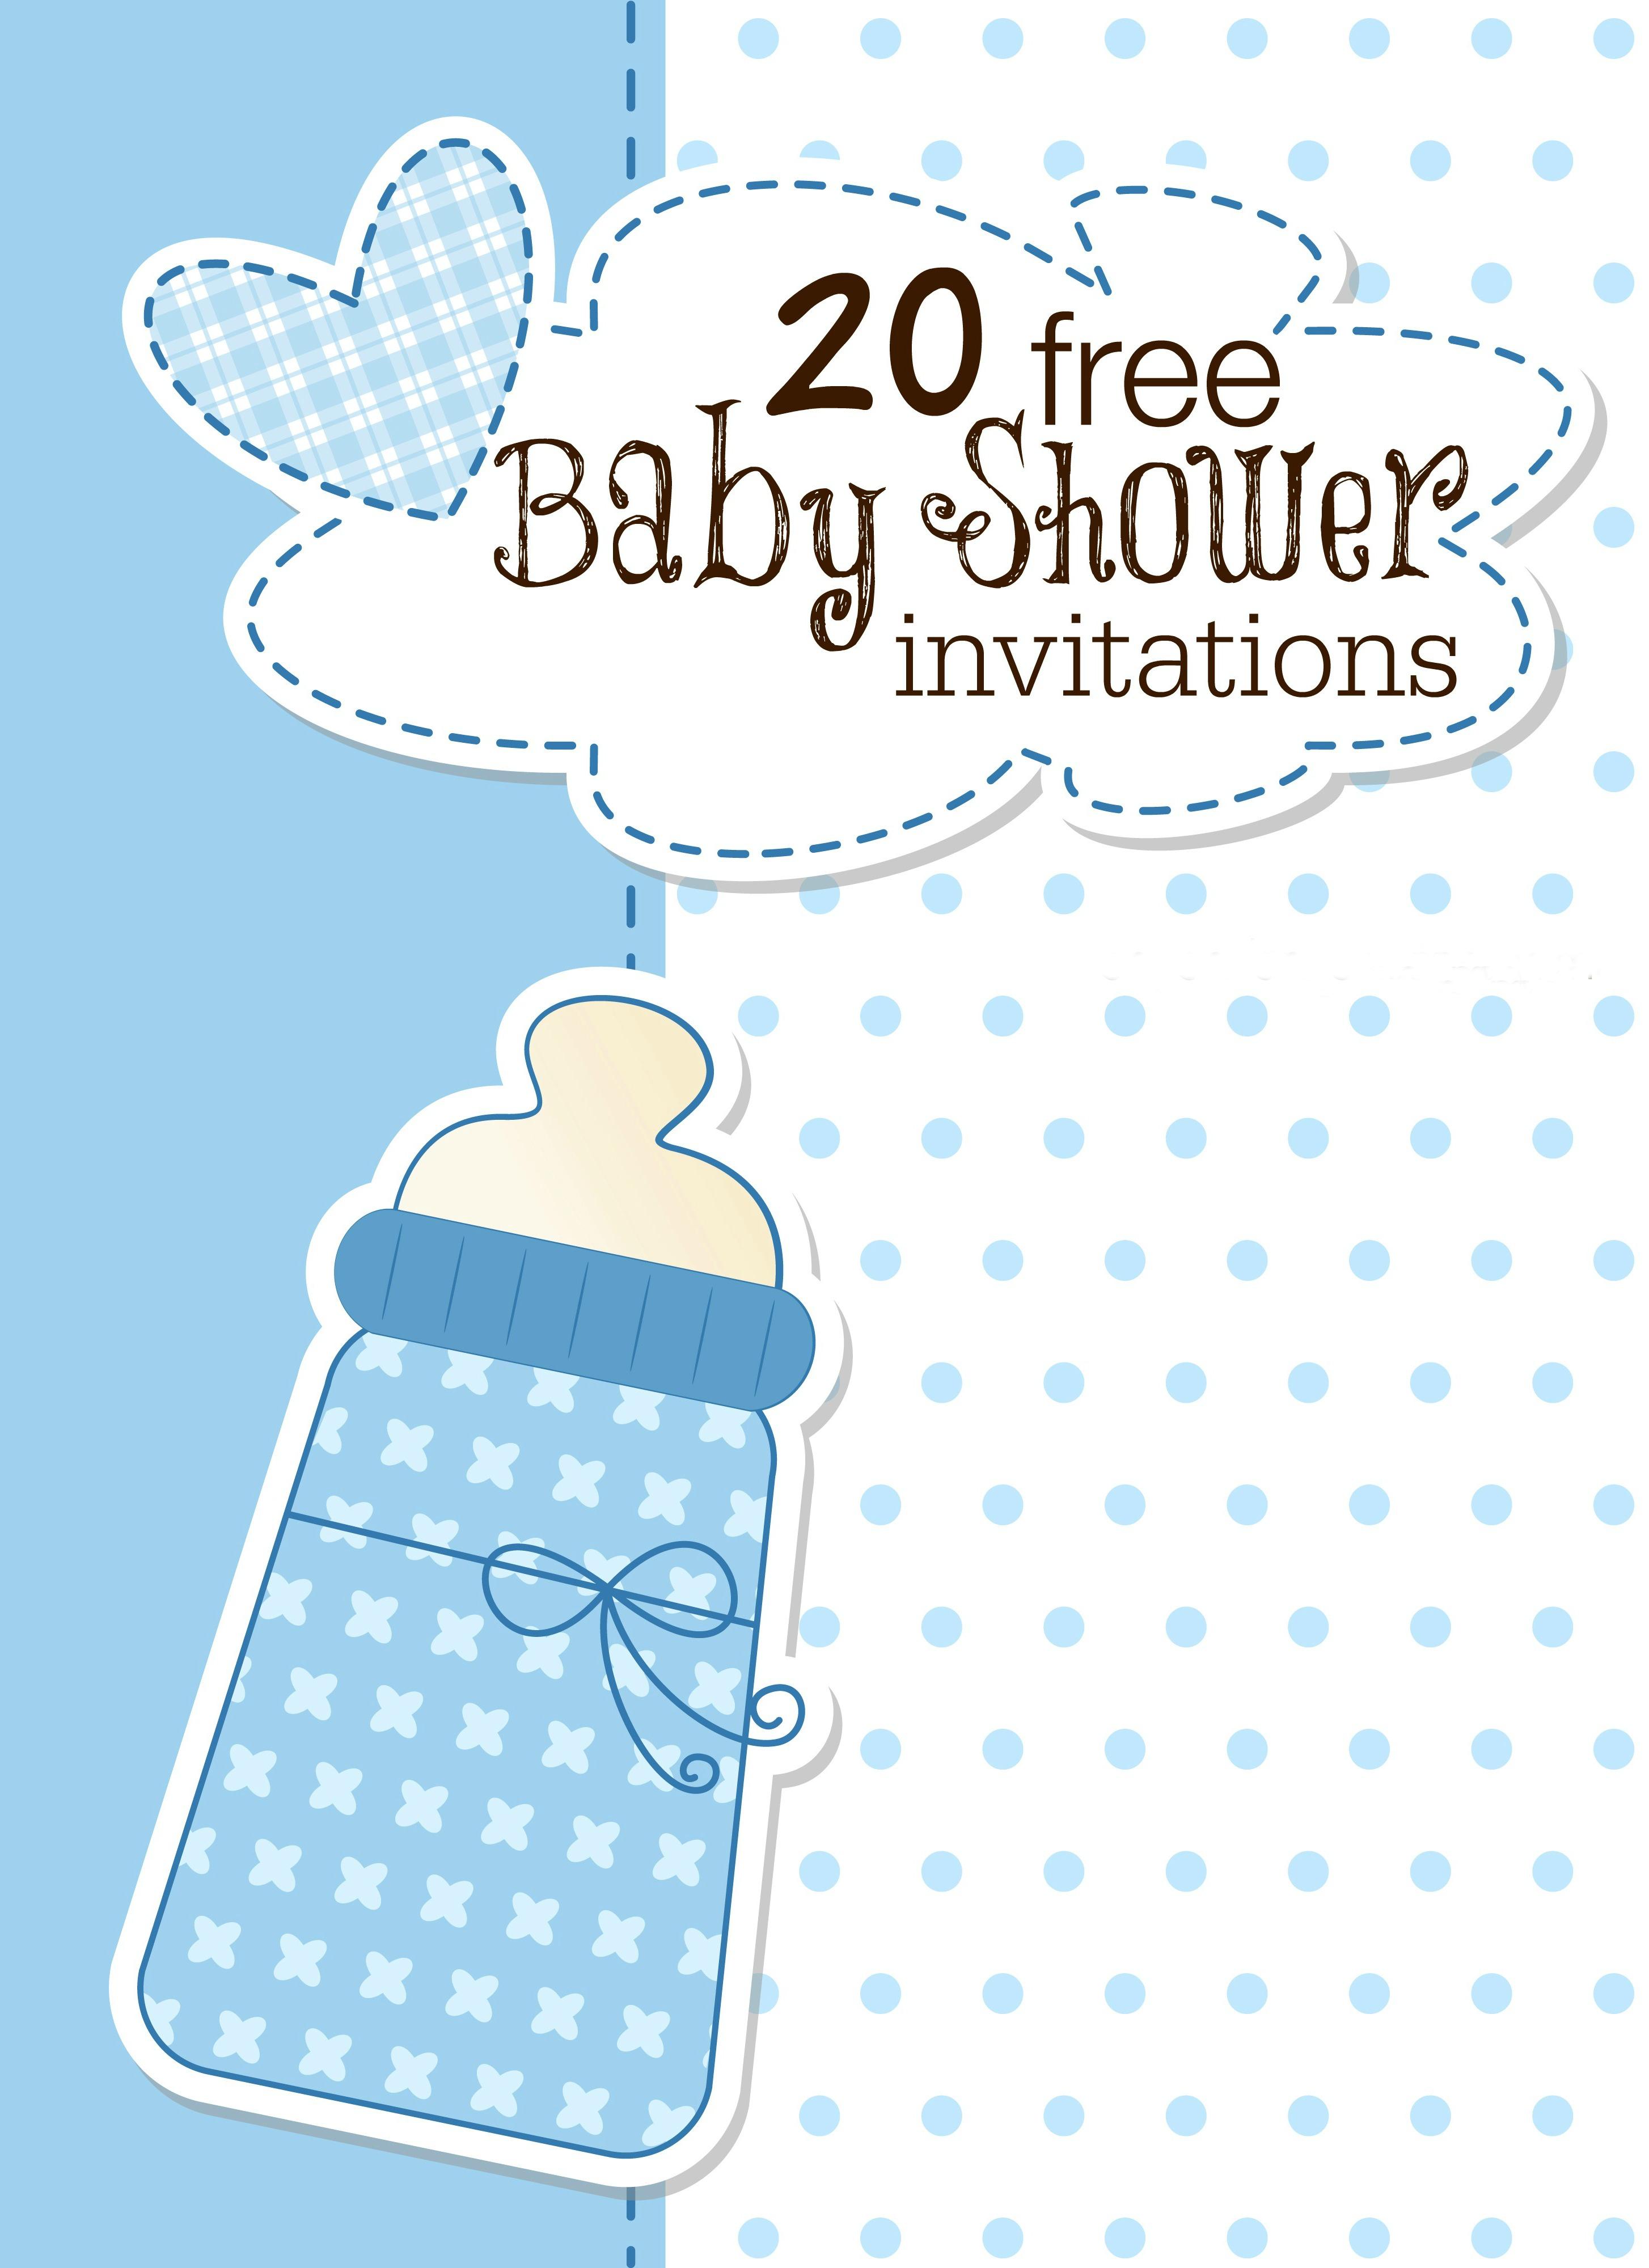 Printable Baby Shower Invitations - Free Printable Baby Shower Invitations Templates For Boys